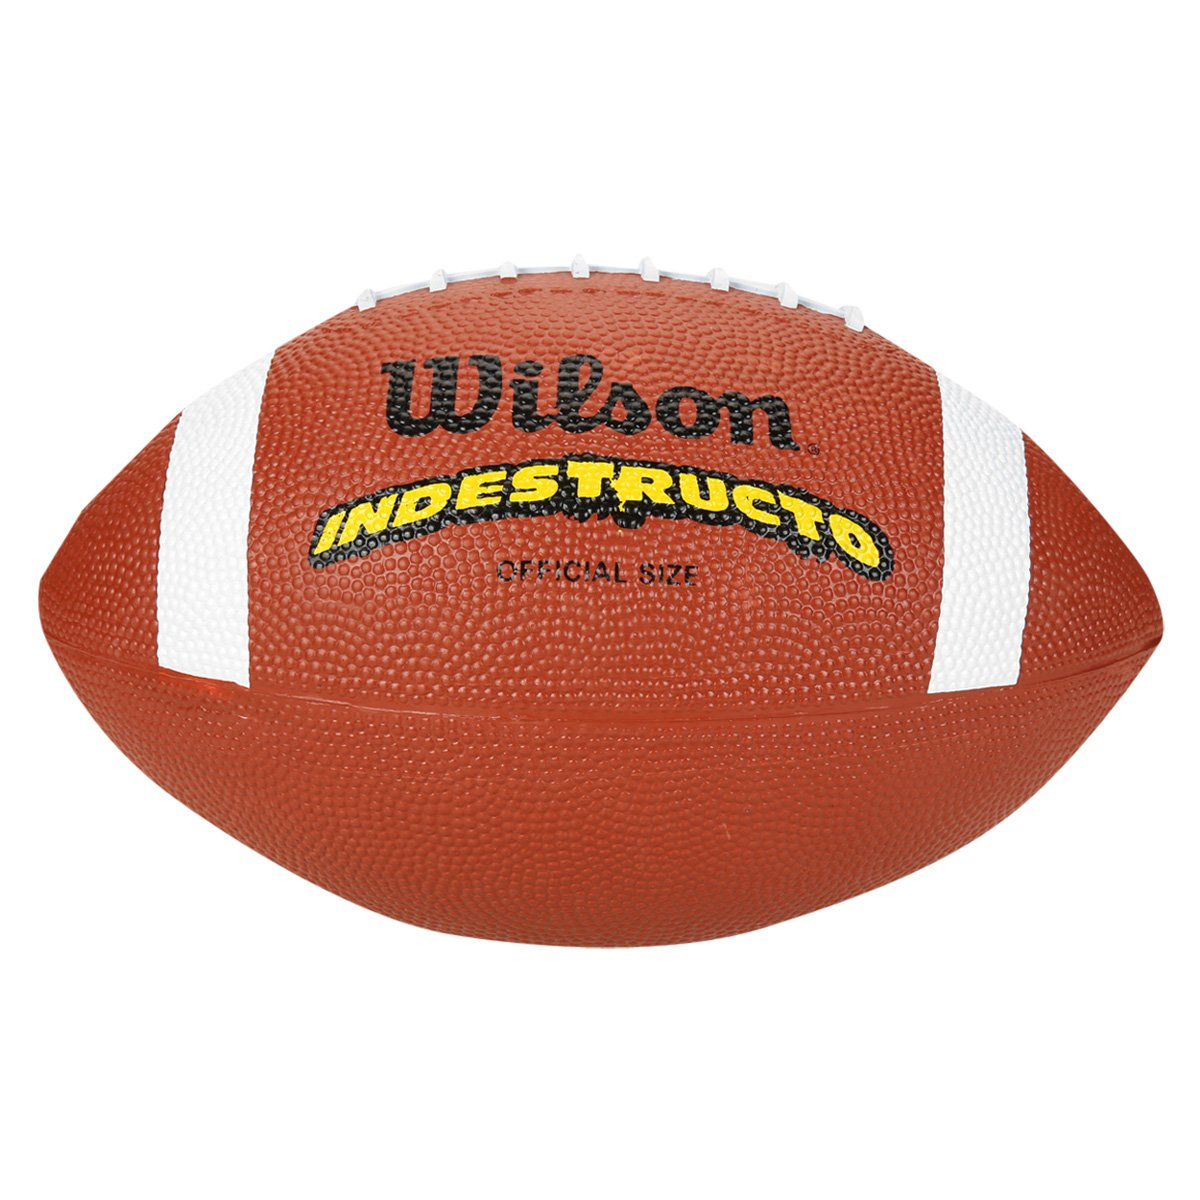 WILSON Football Americano,